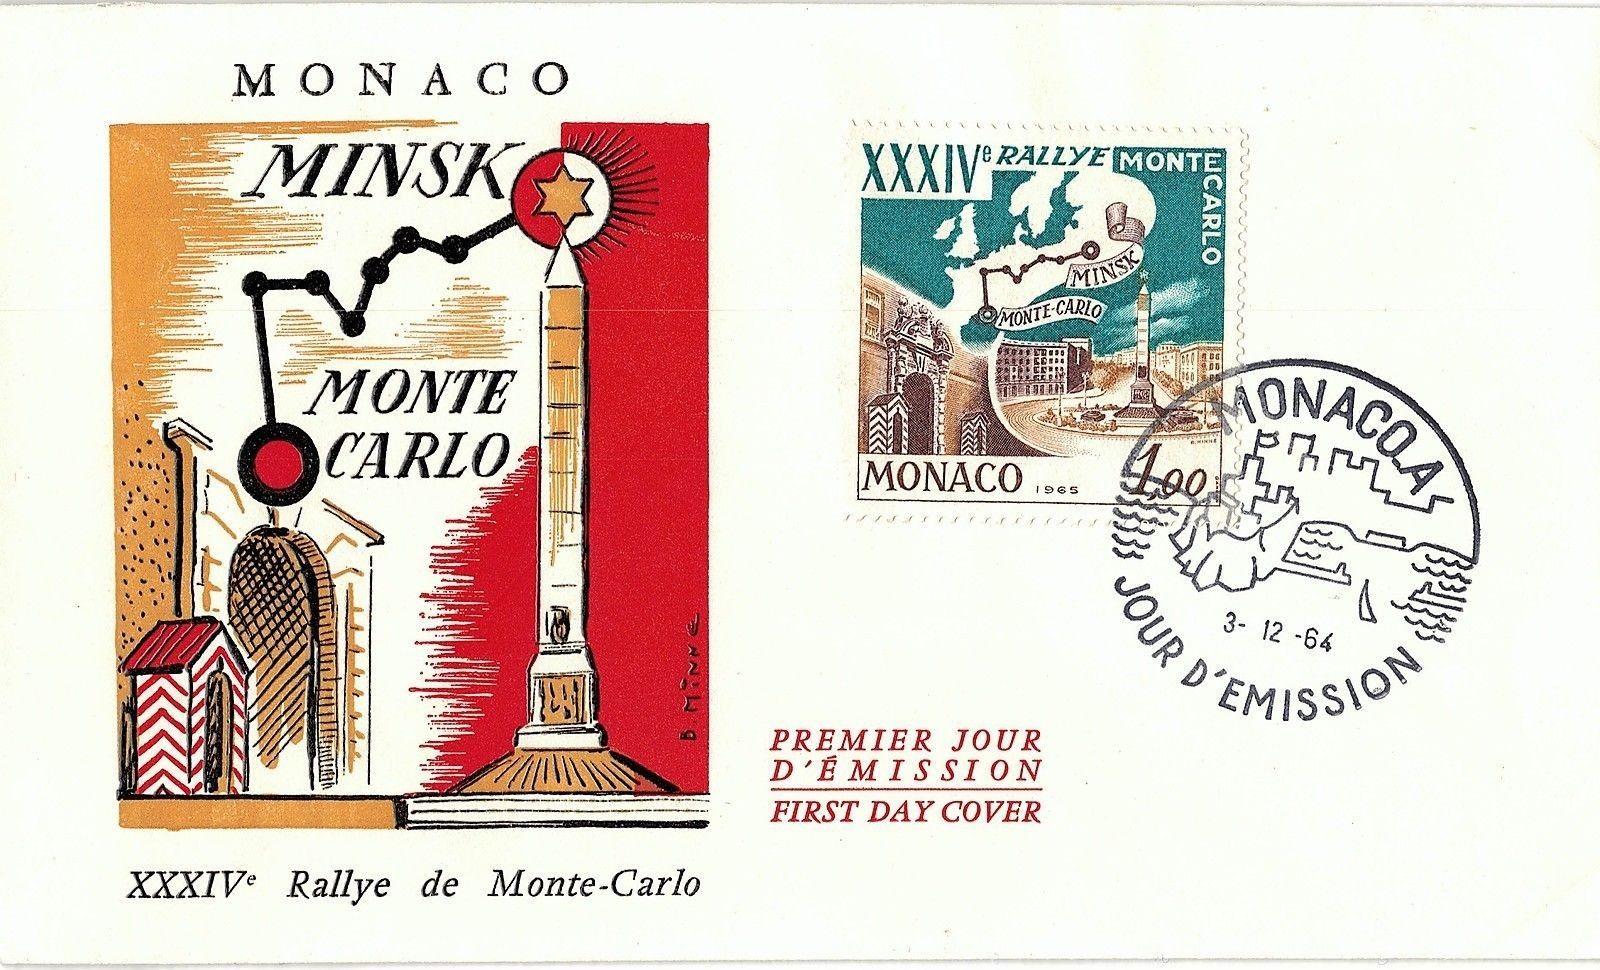 Monaco - Scott #600 (1964) first day cover